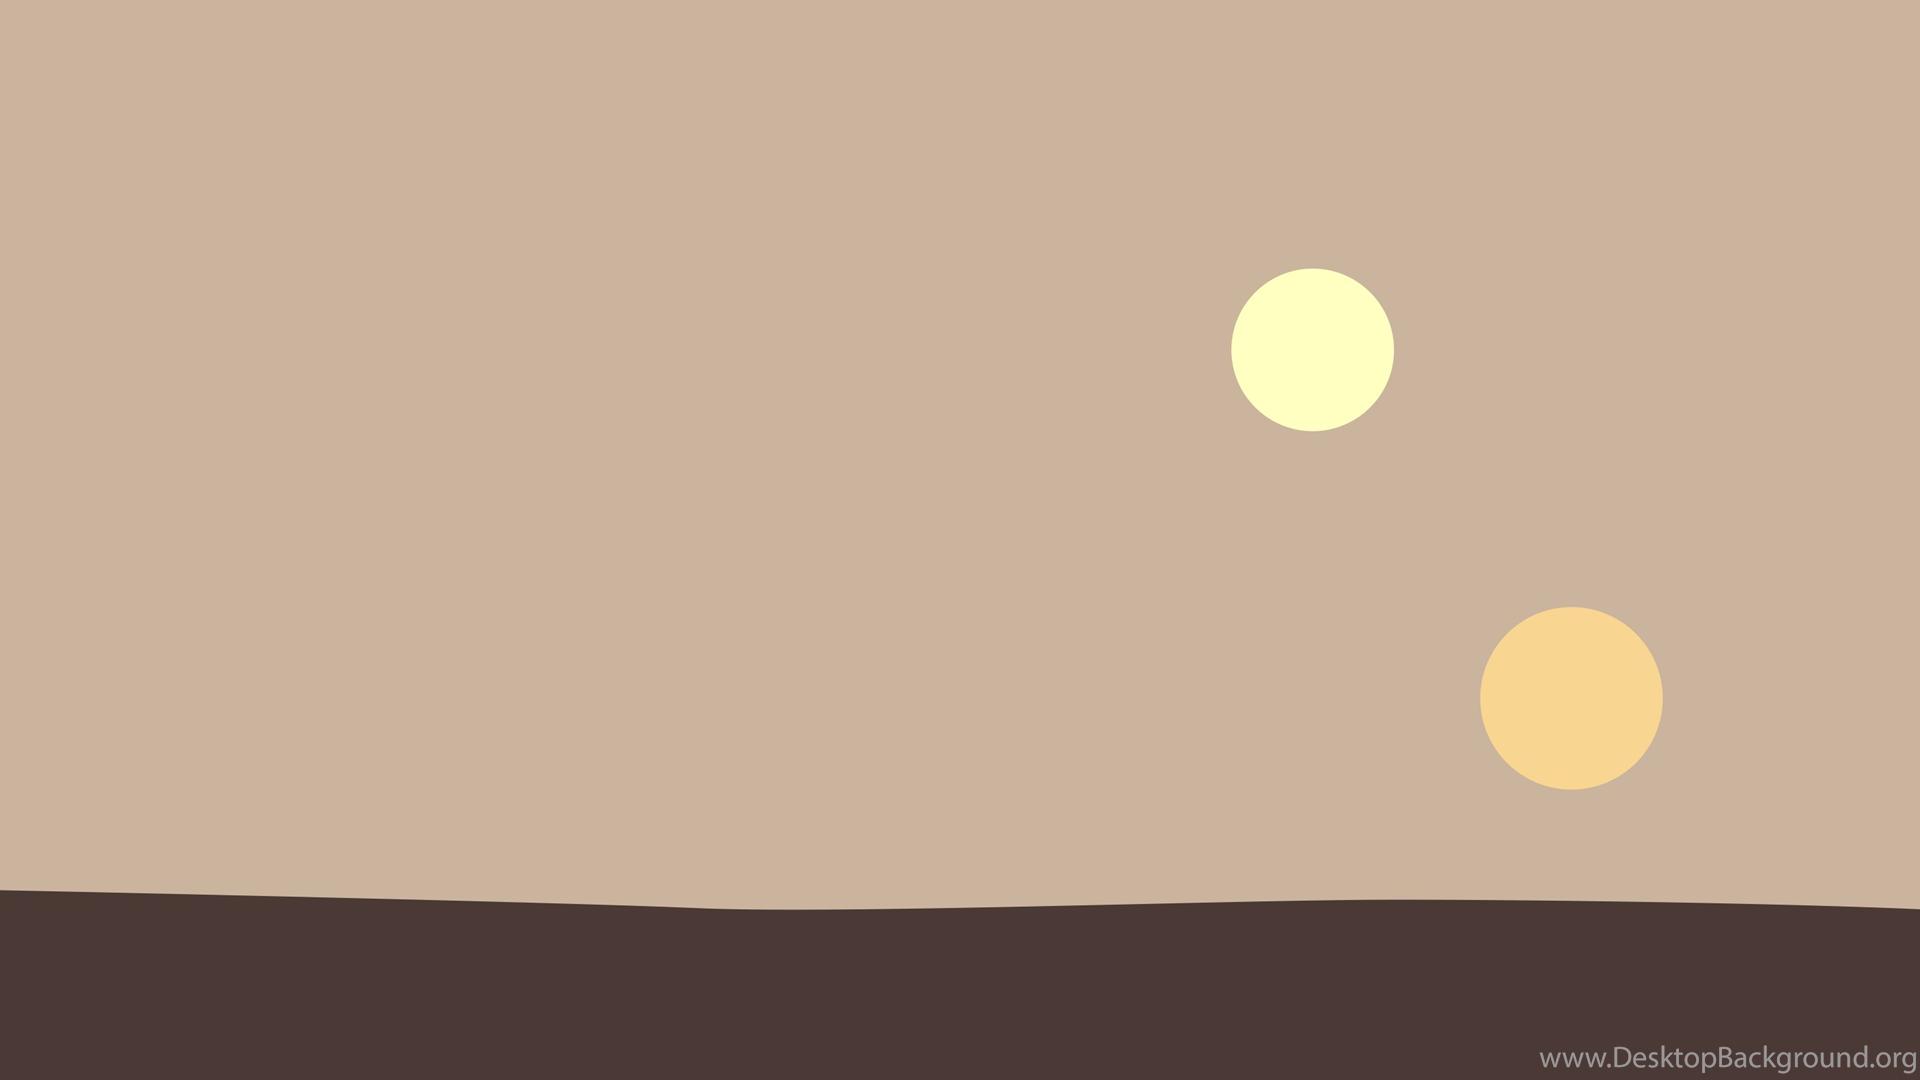 Minimalist Tatooine Wallpapers 2880x1800 Starwars Desktop Background